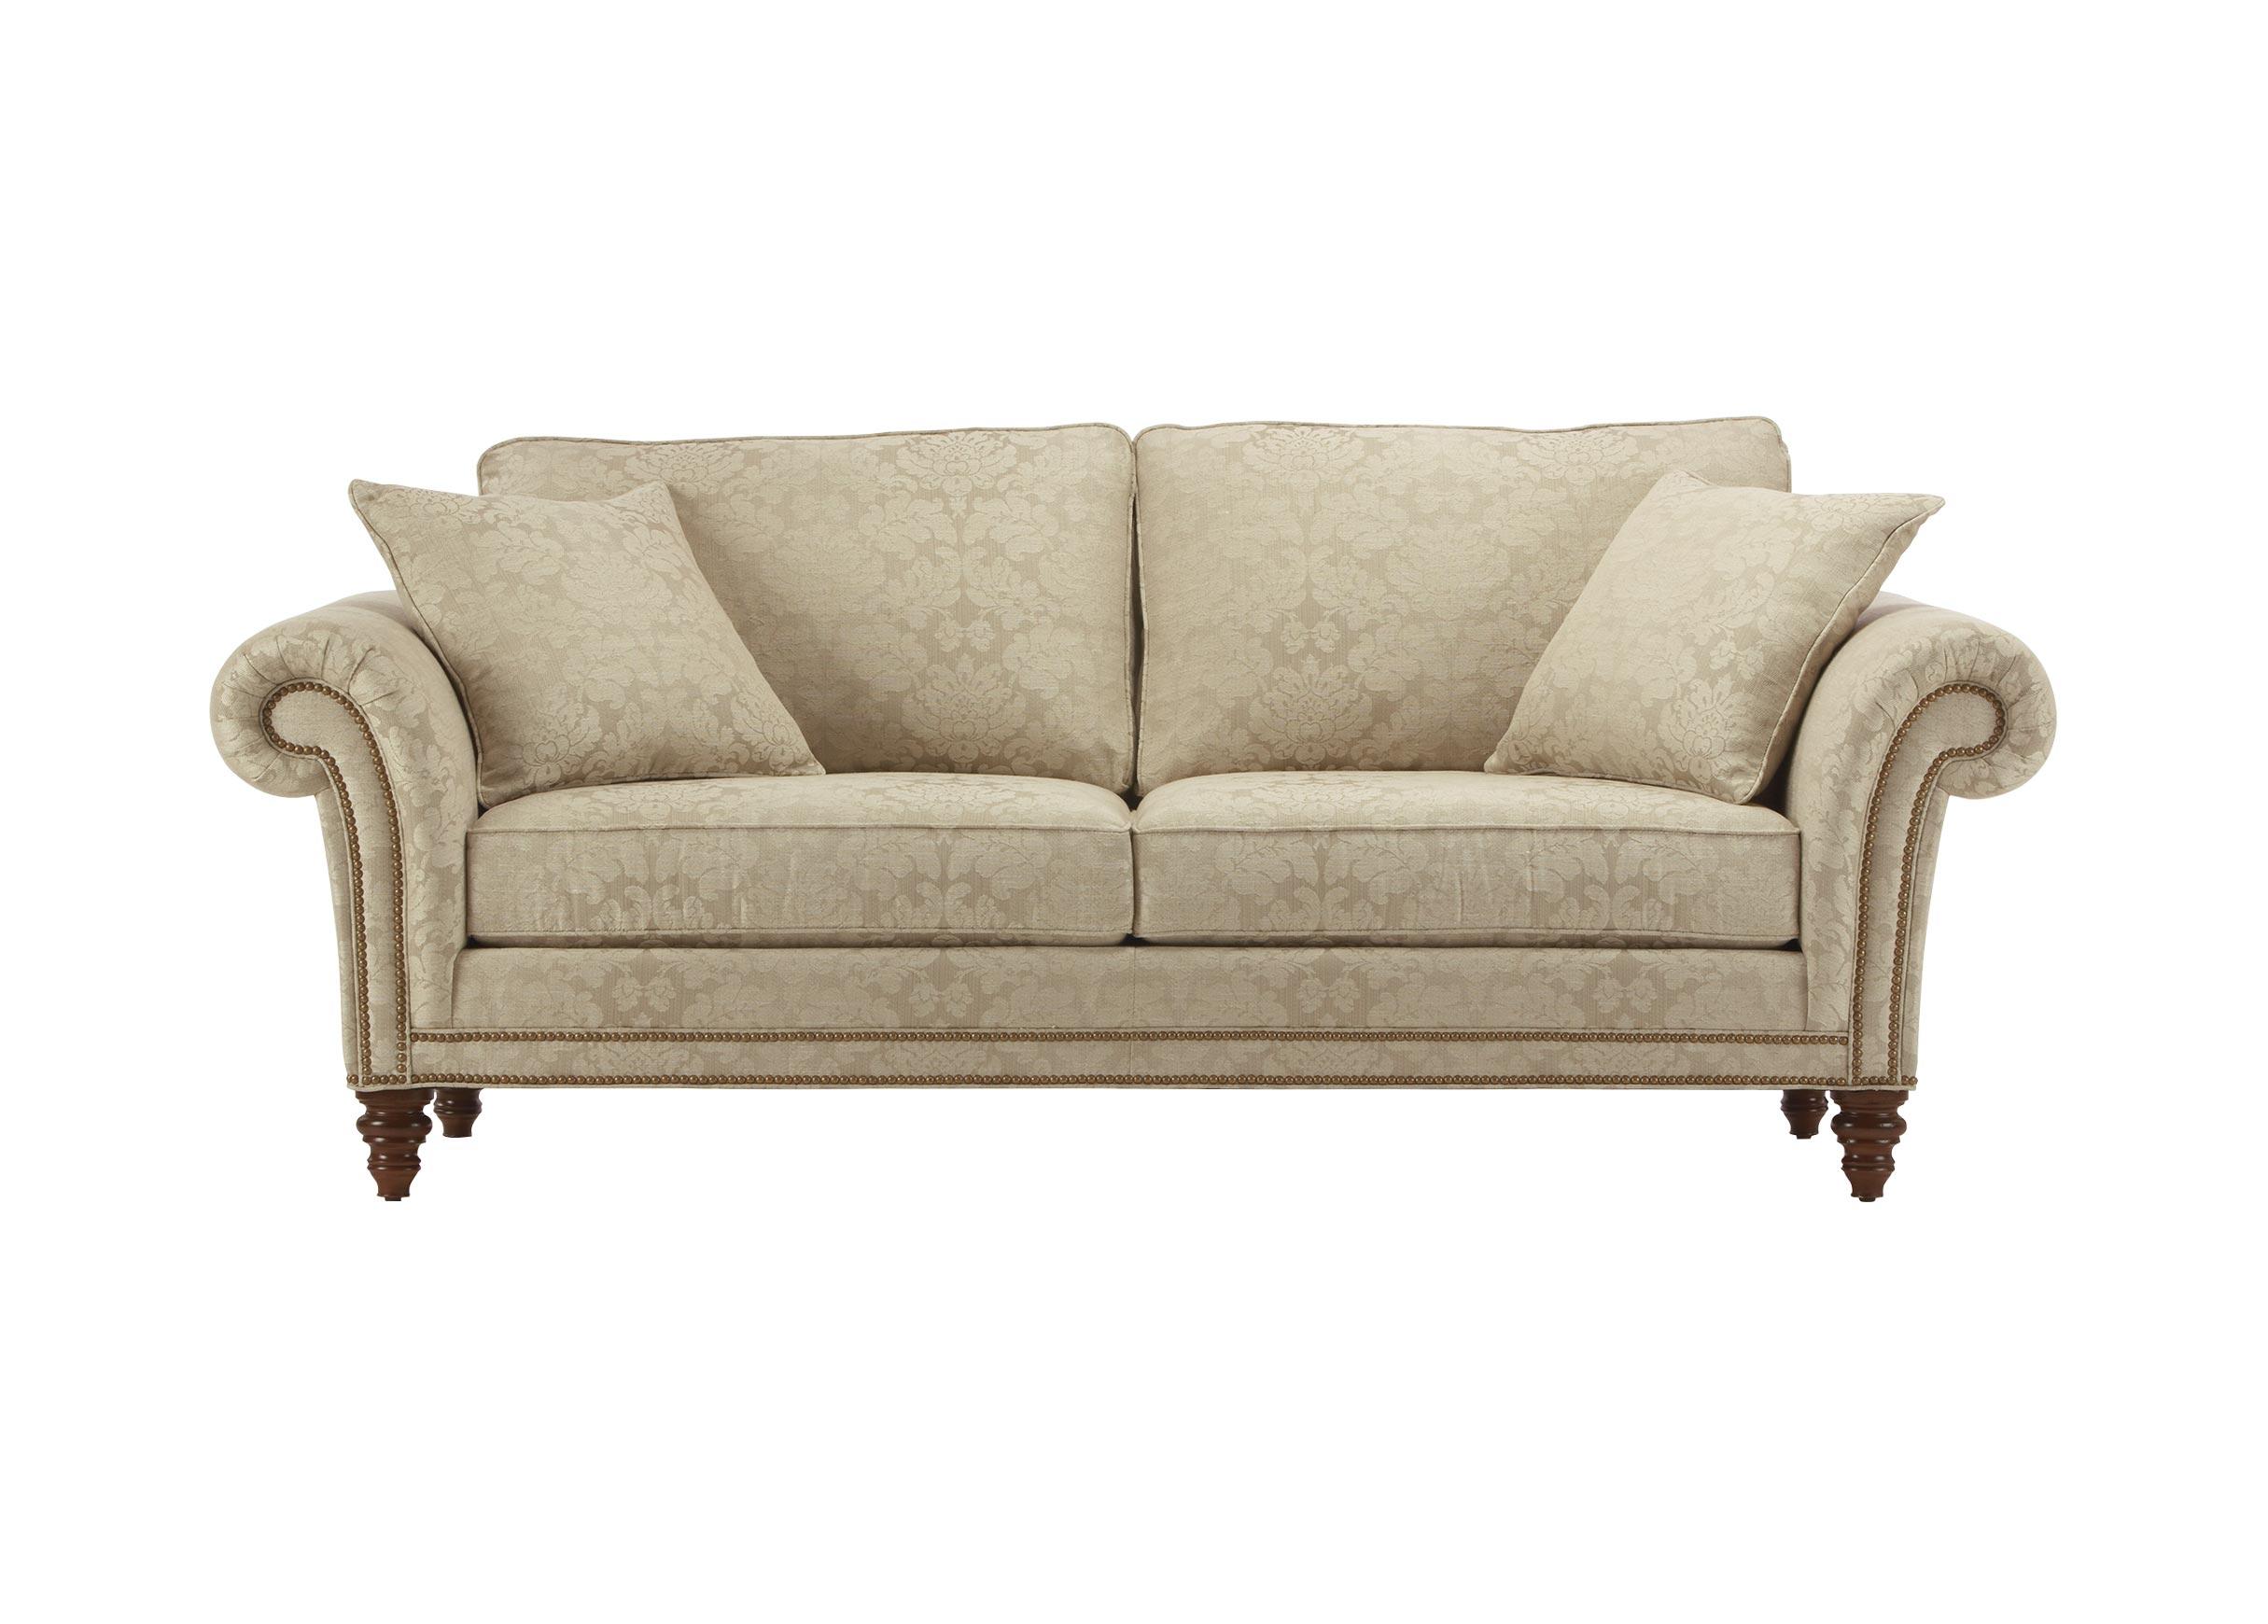 savoy leather sofa restoration hardware sofasofa newport sofas loveseats ethan allen thesofa